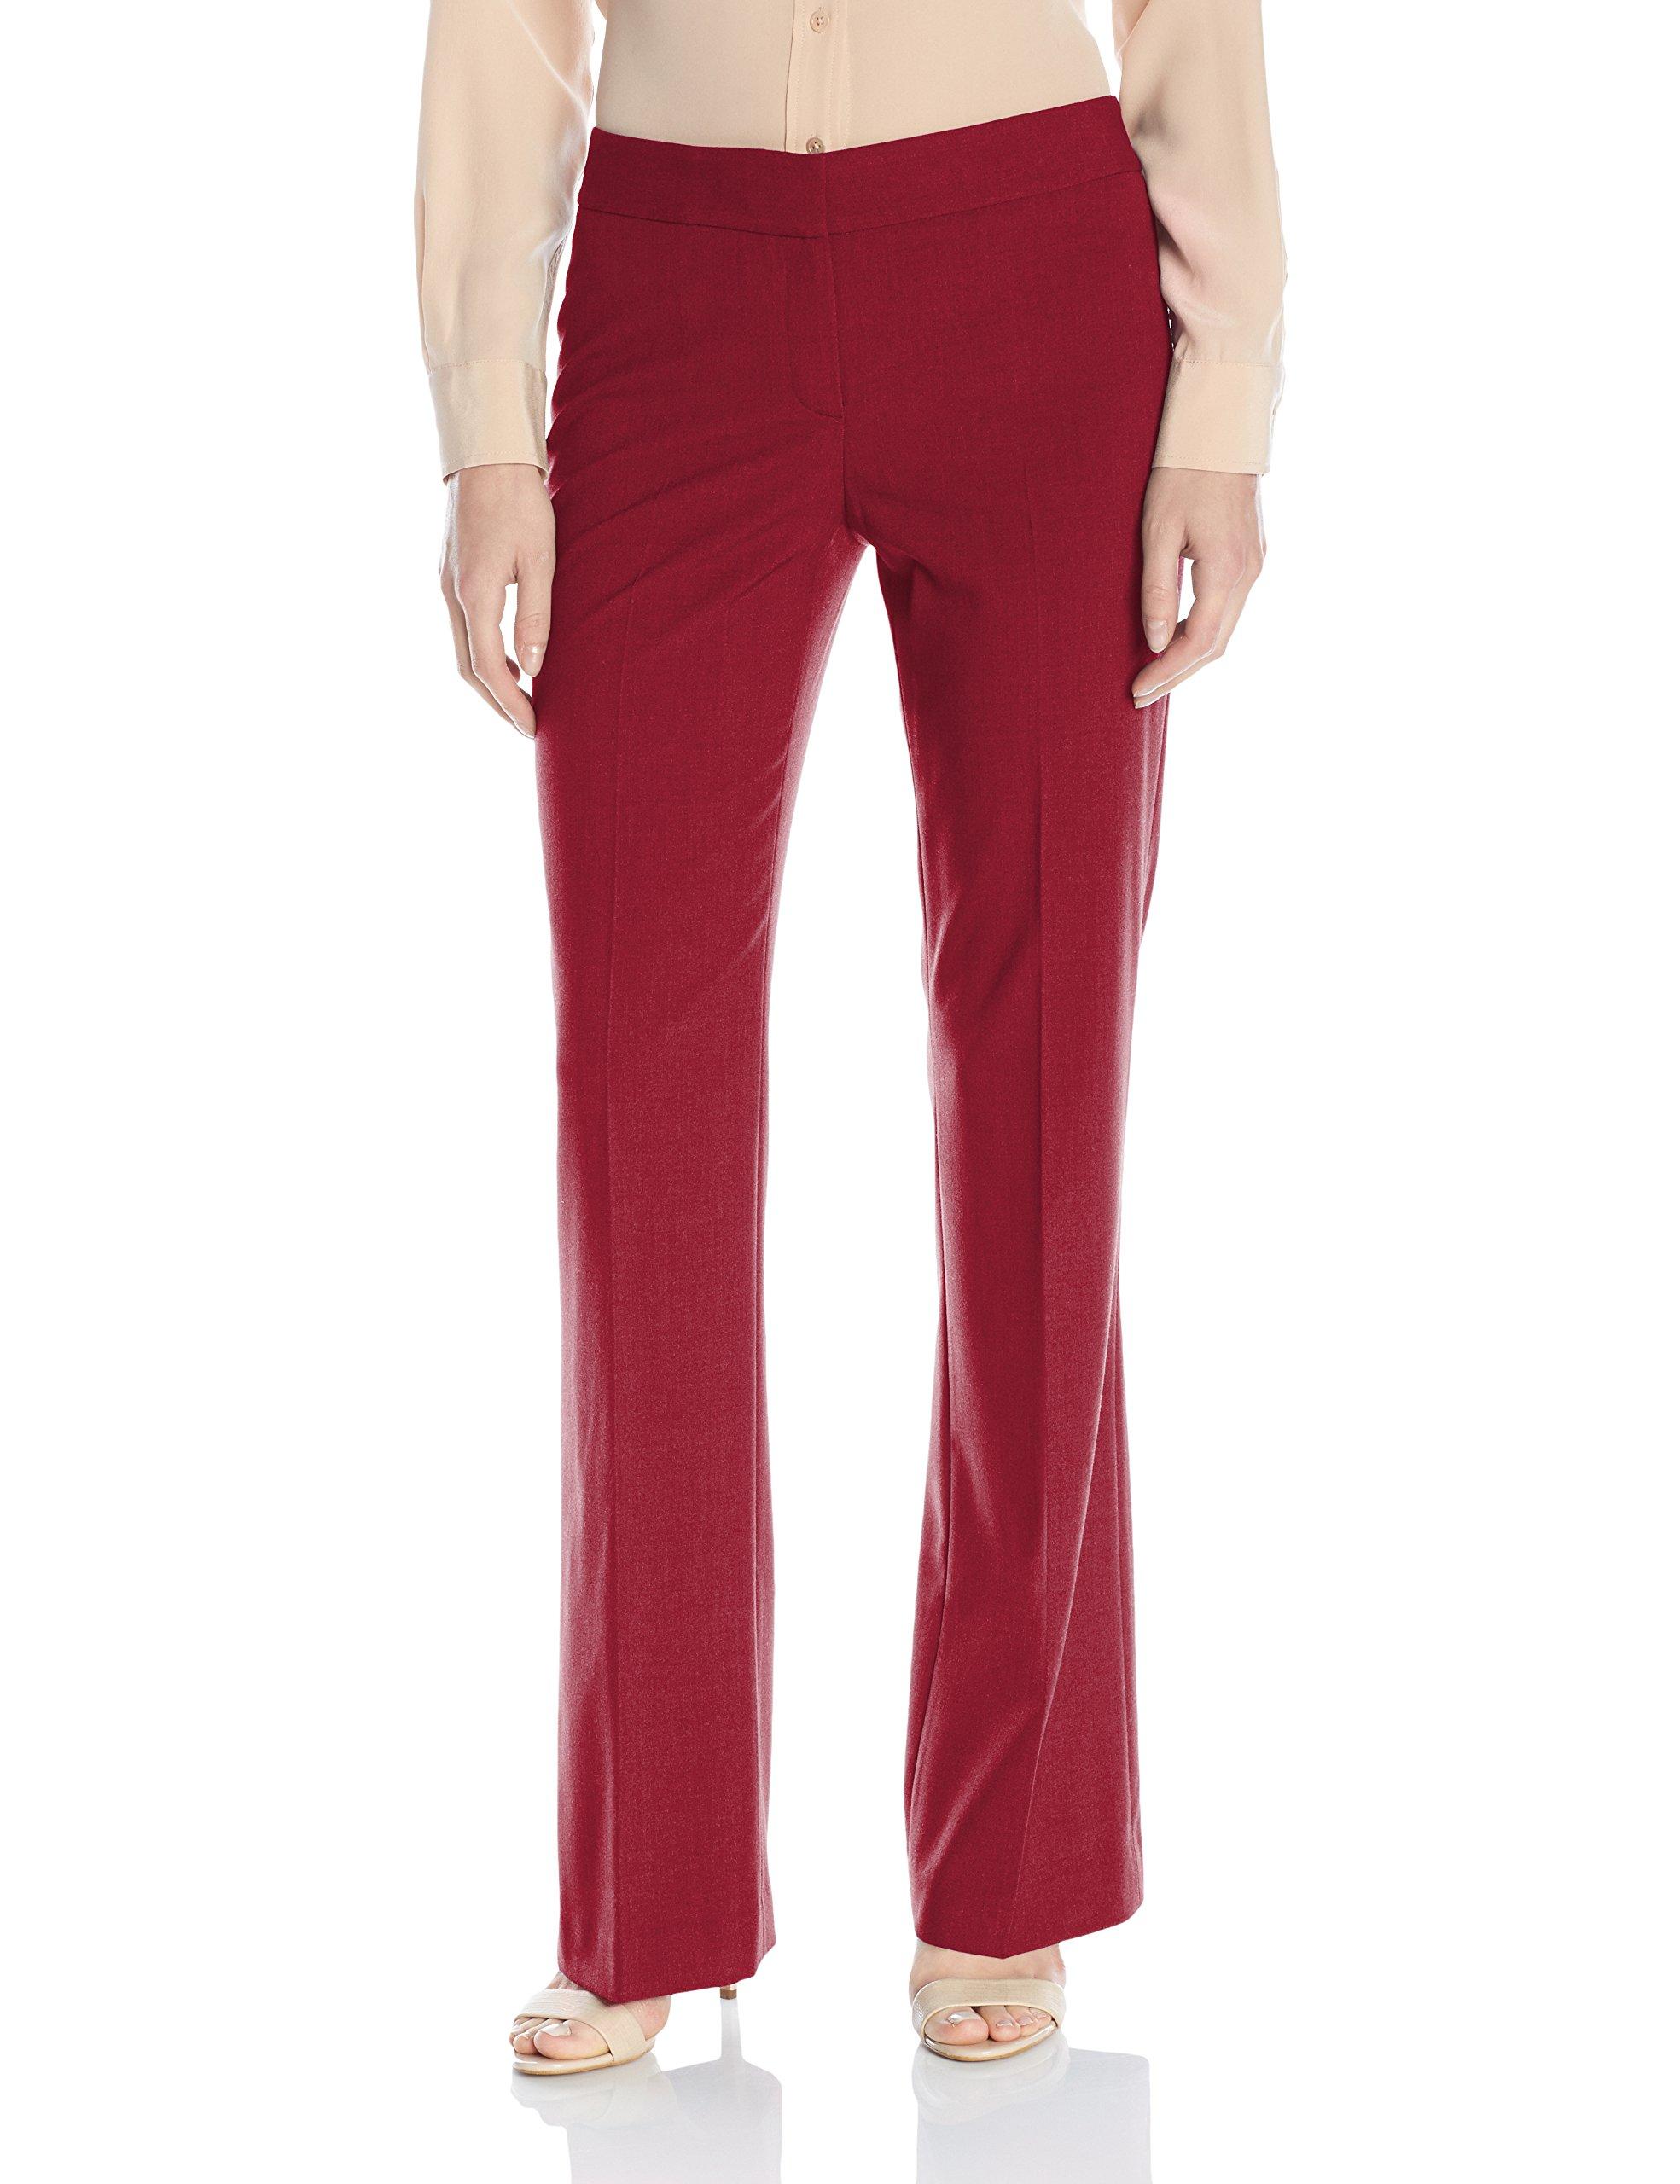 Dark Red Womens Wide-Leg Dress Pants Stretch $79 16